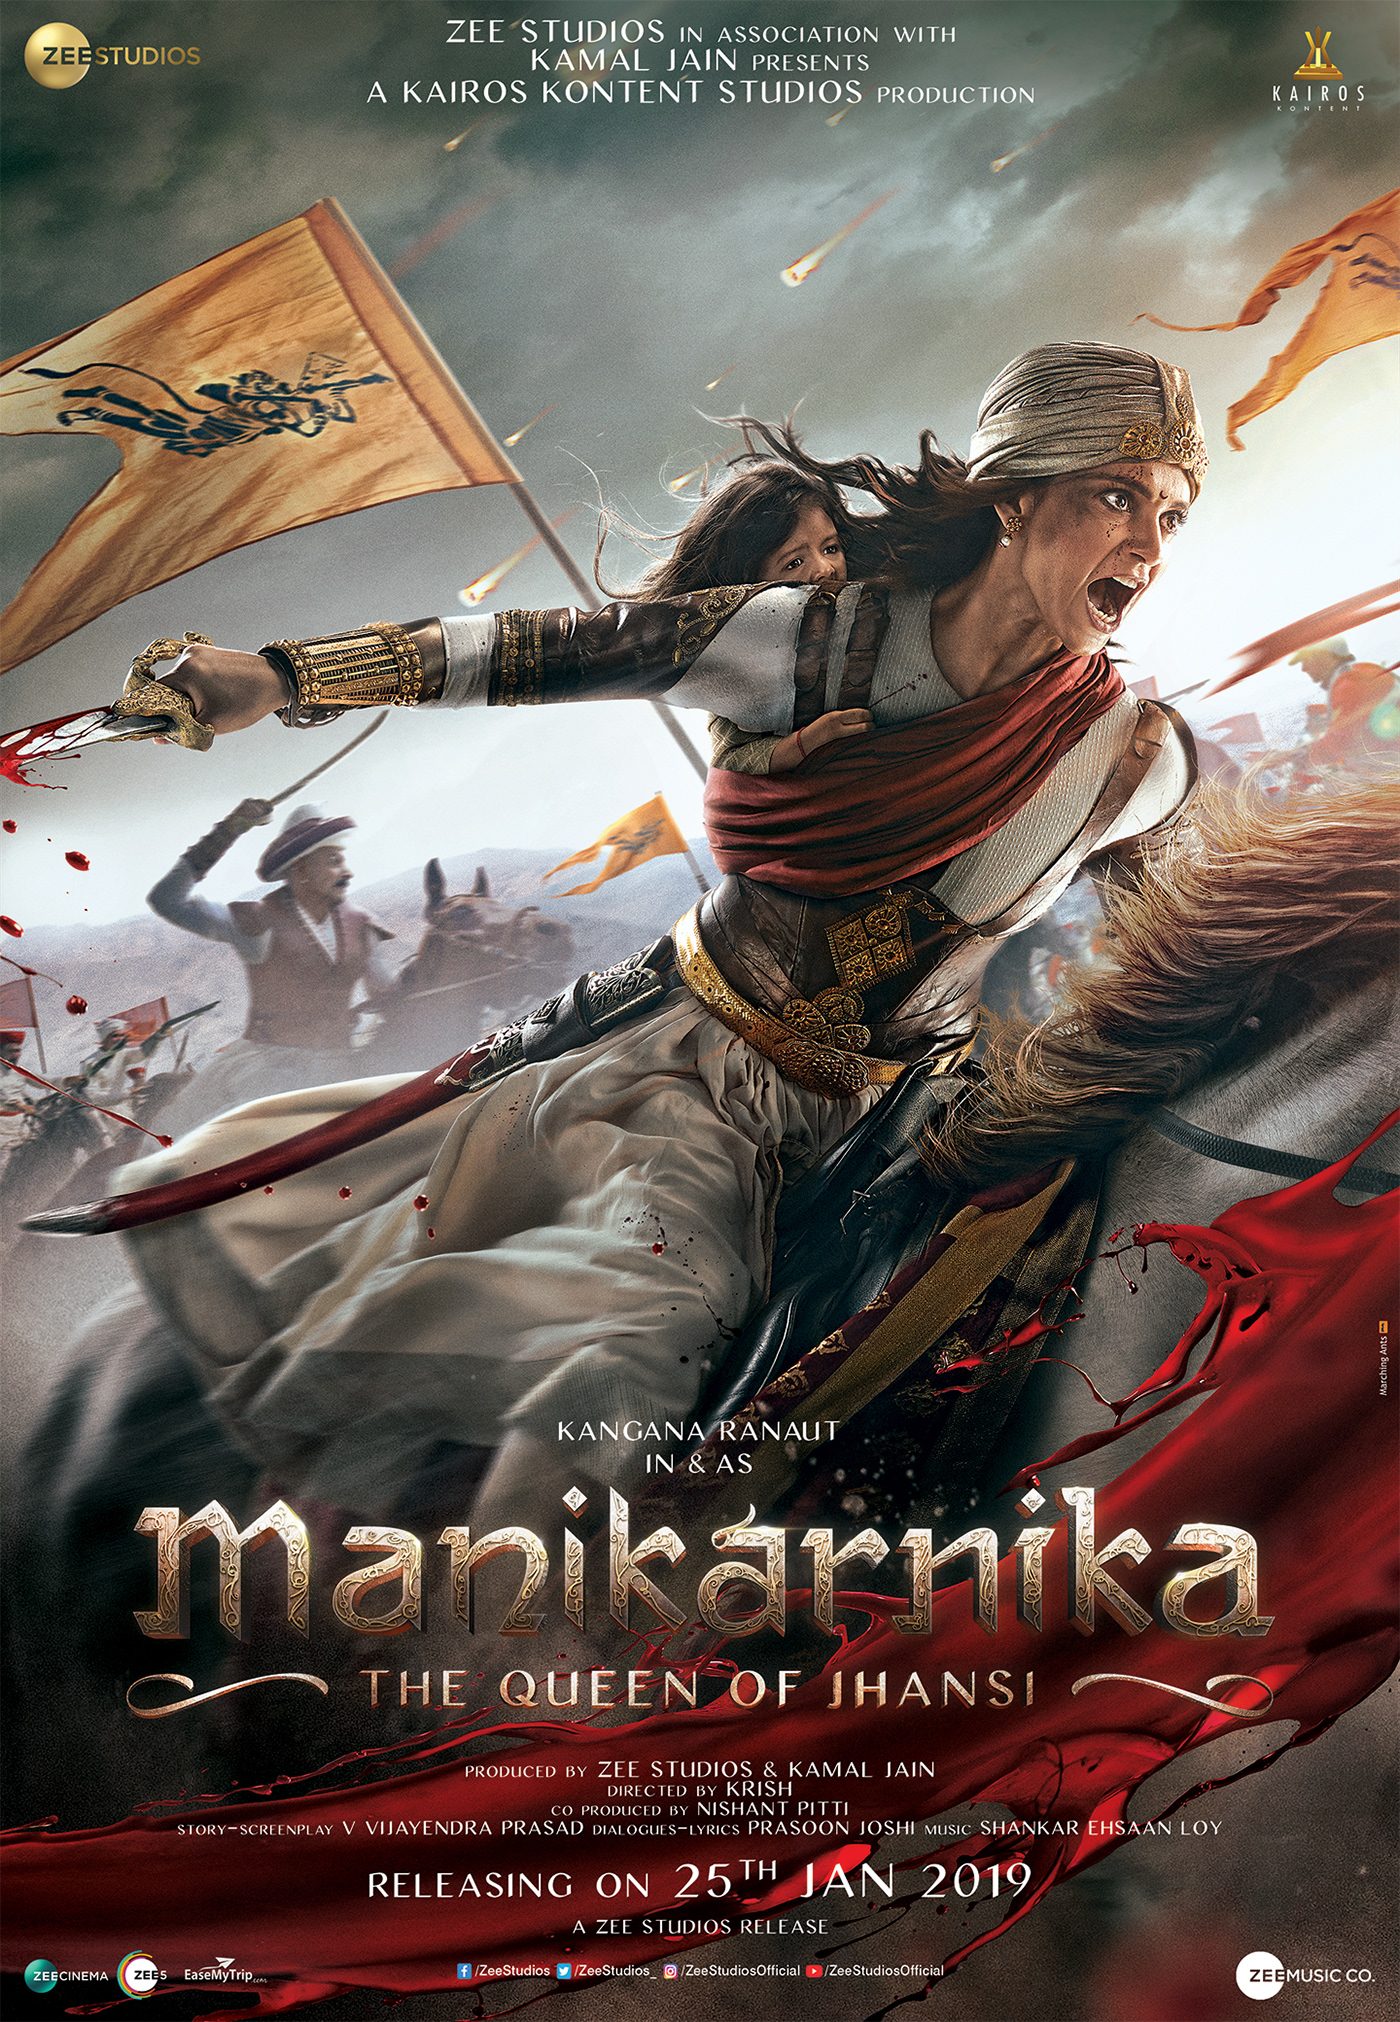 Manikarnika : The Queen of Jhansi (2019) 720p Pre-DVDRip x264 MP3 Hindi 1.37GB